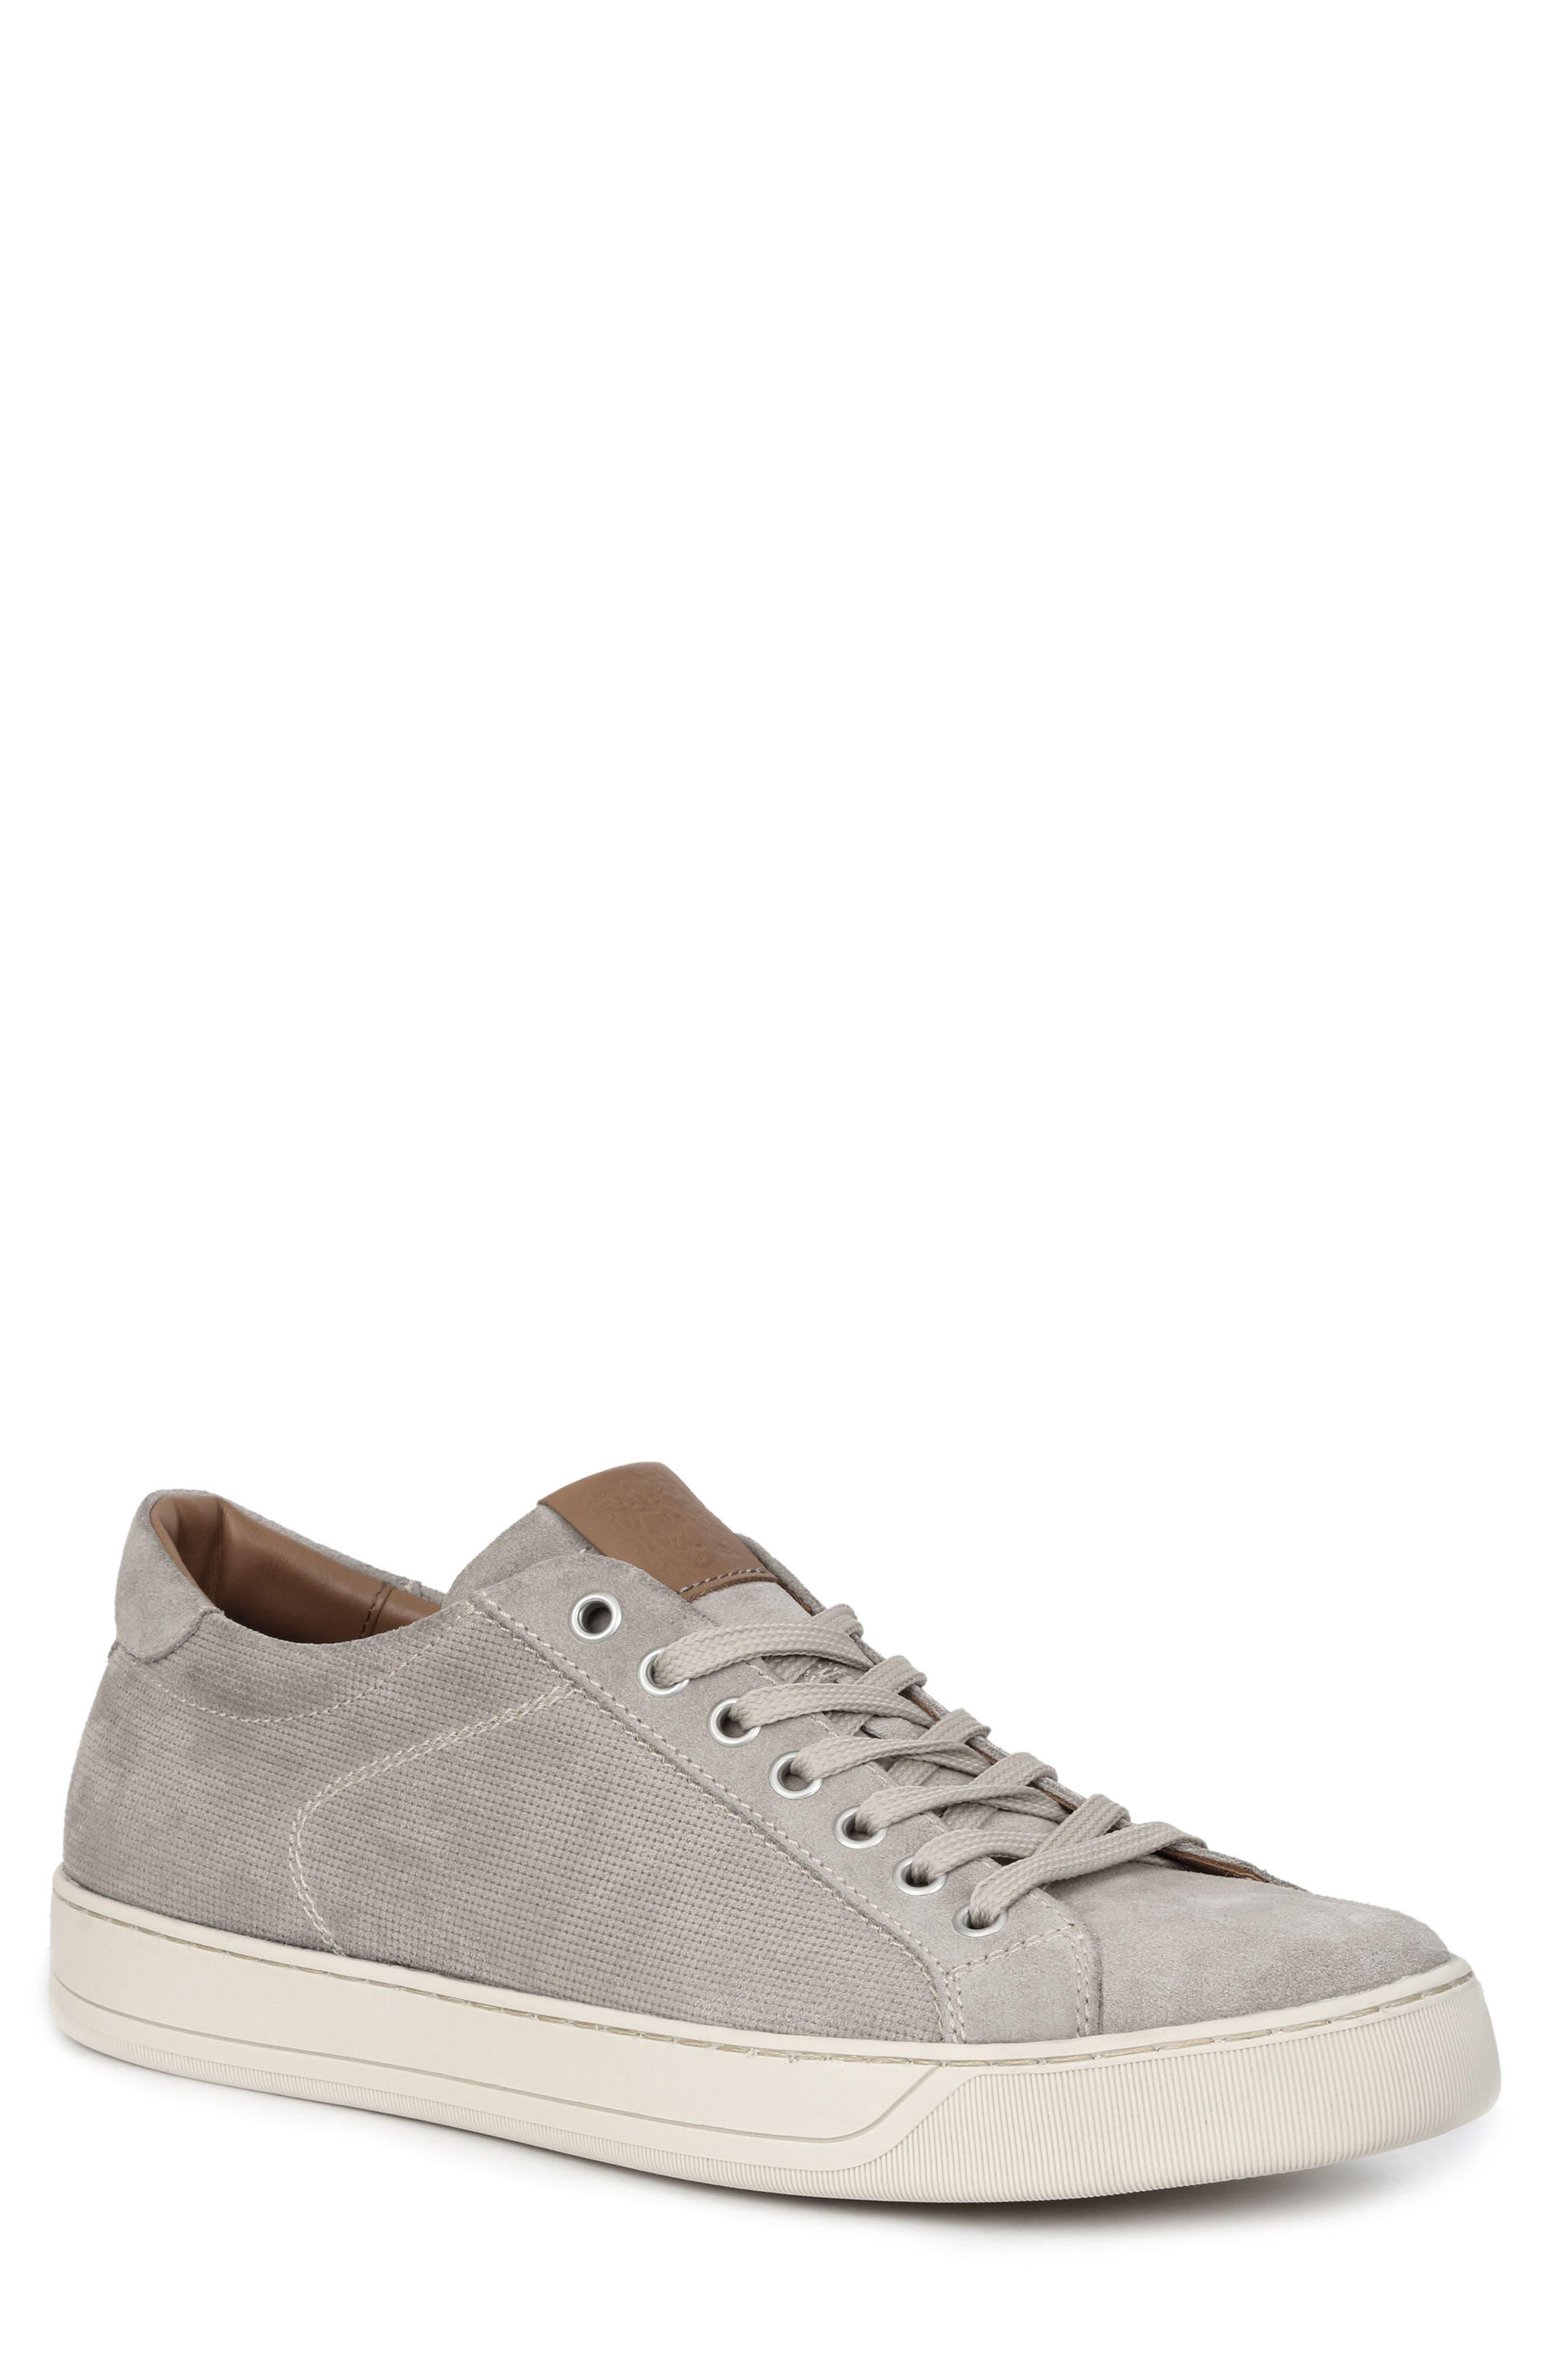 Walter Sneaker,                         Main,                         color, 020